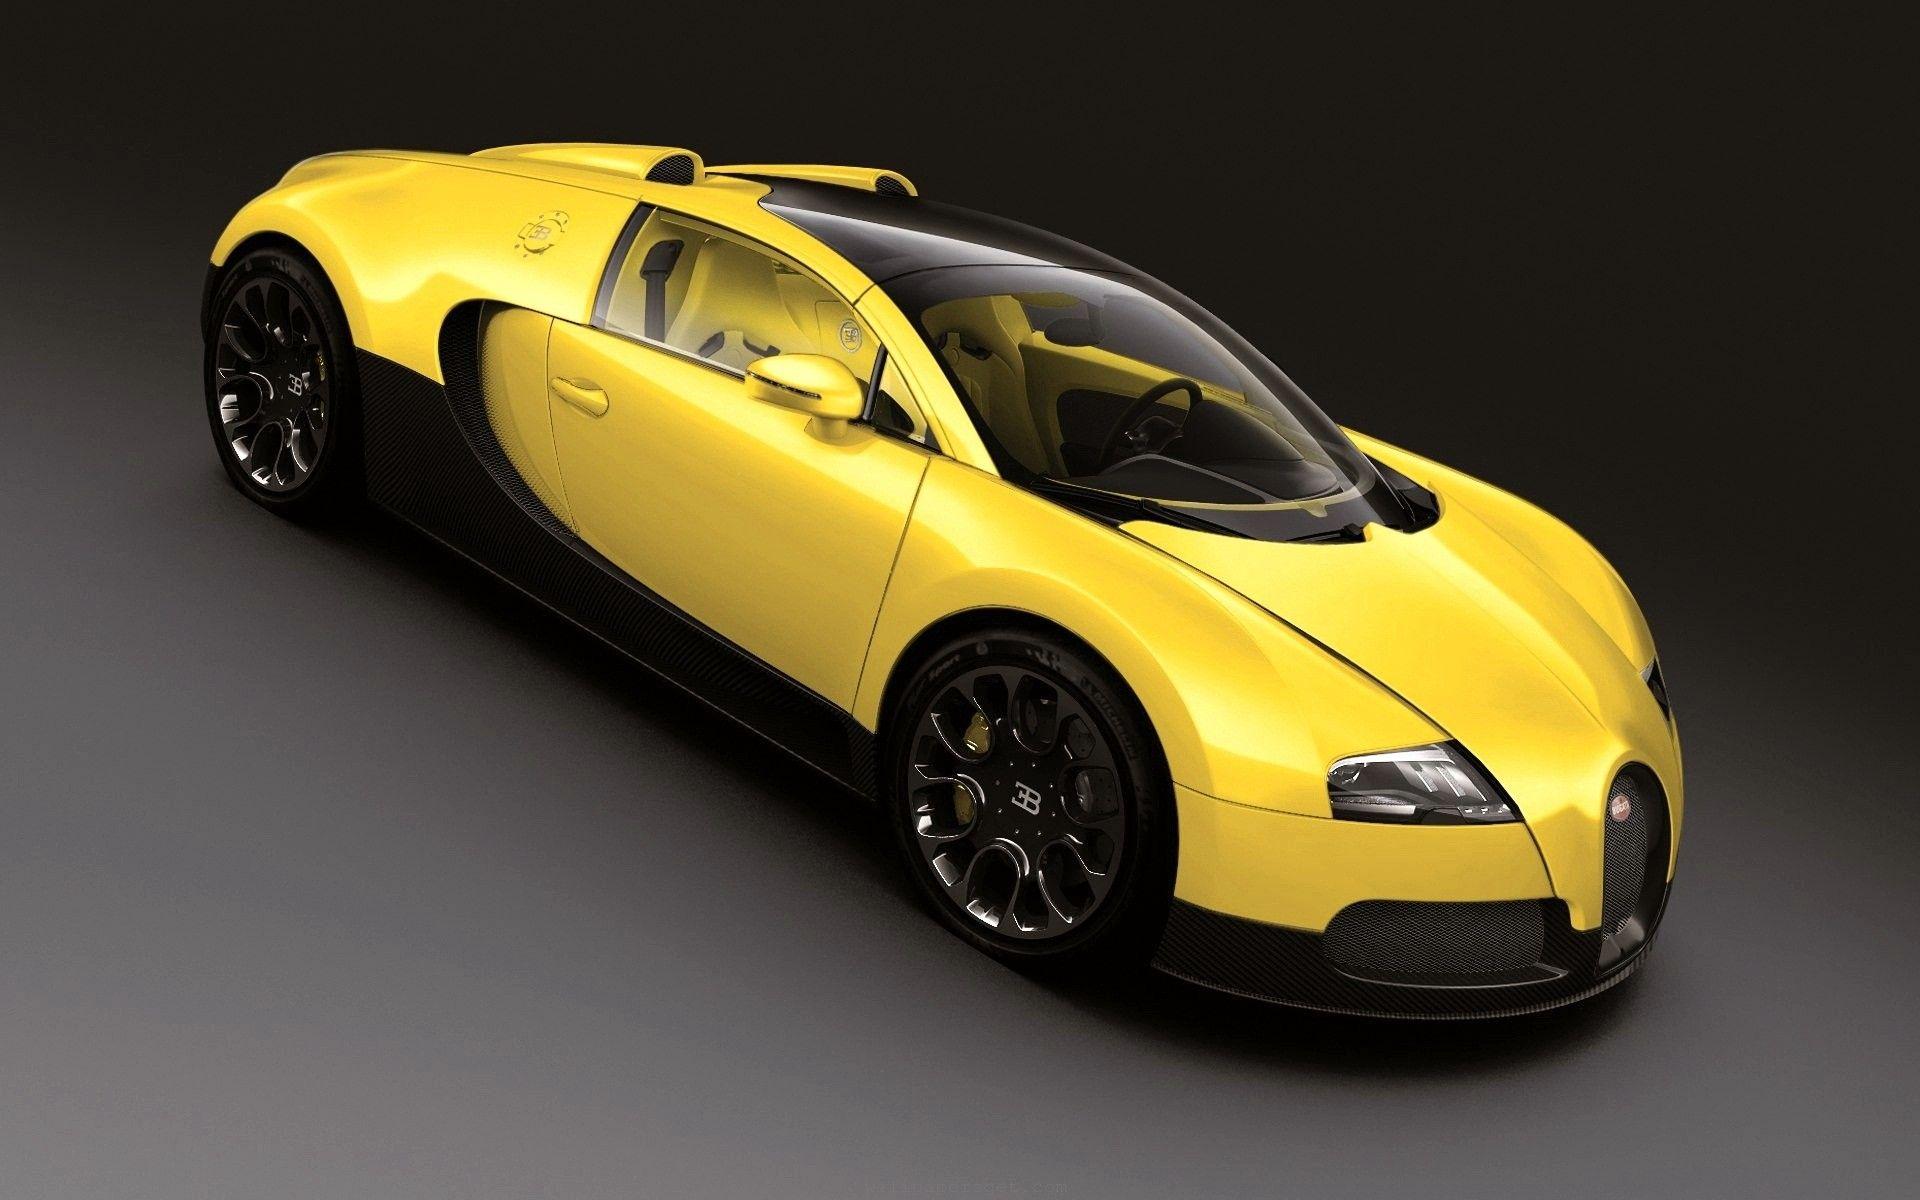 yellow and black -  Google